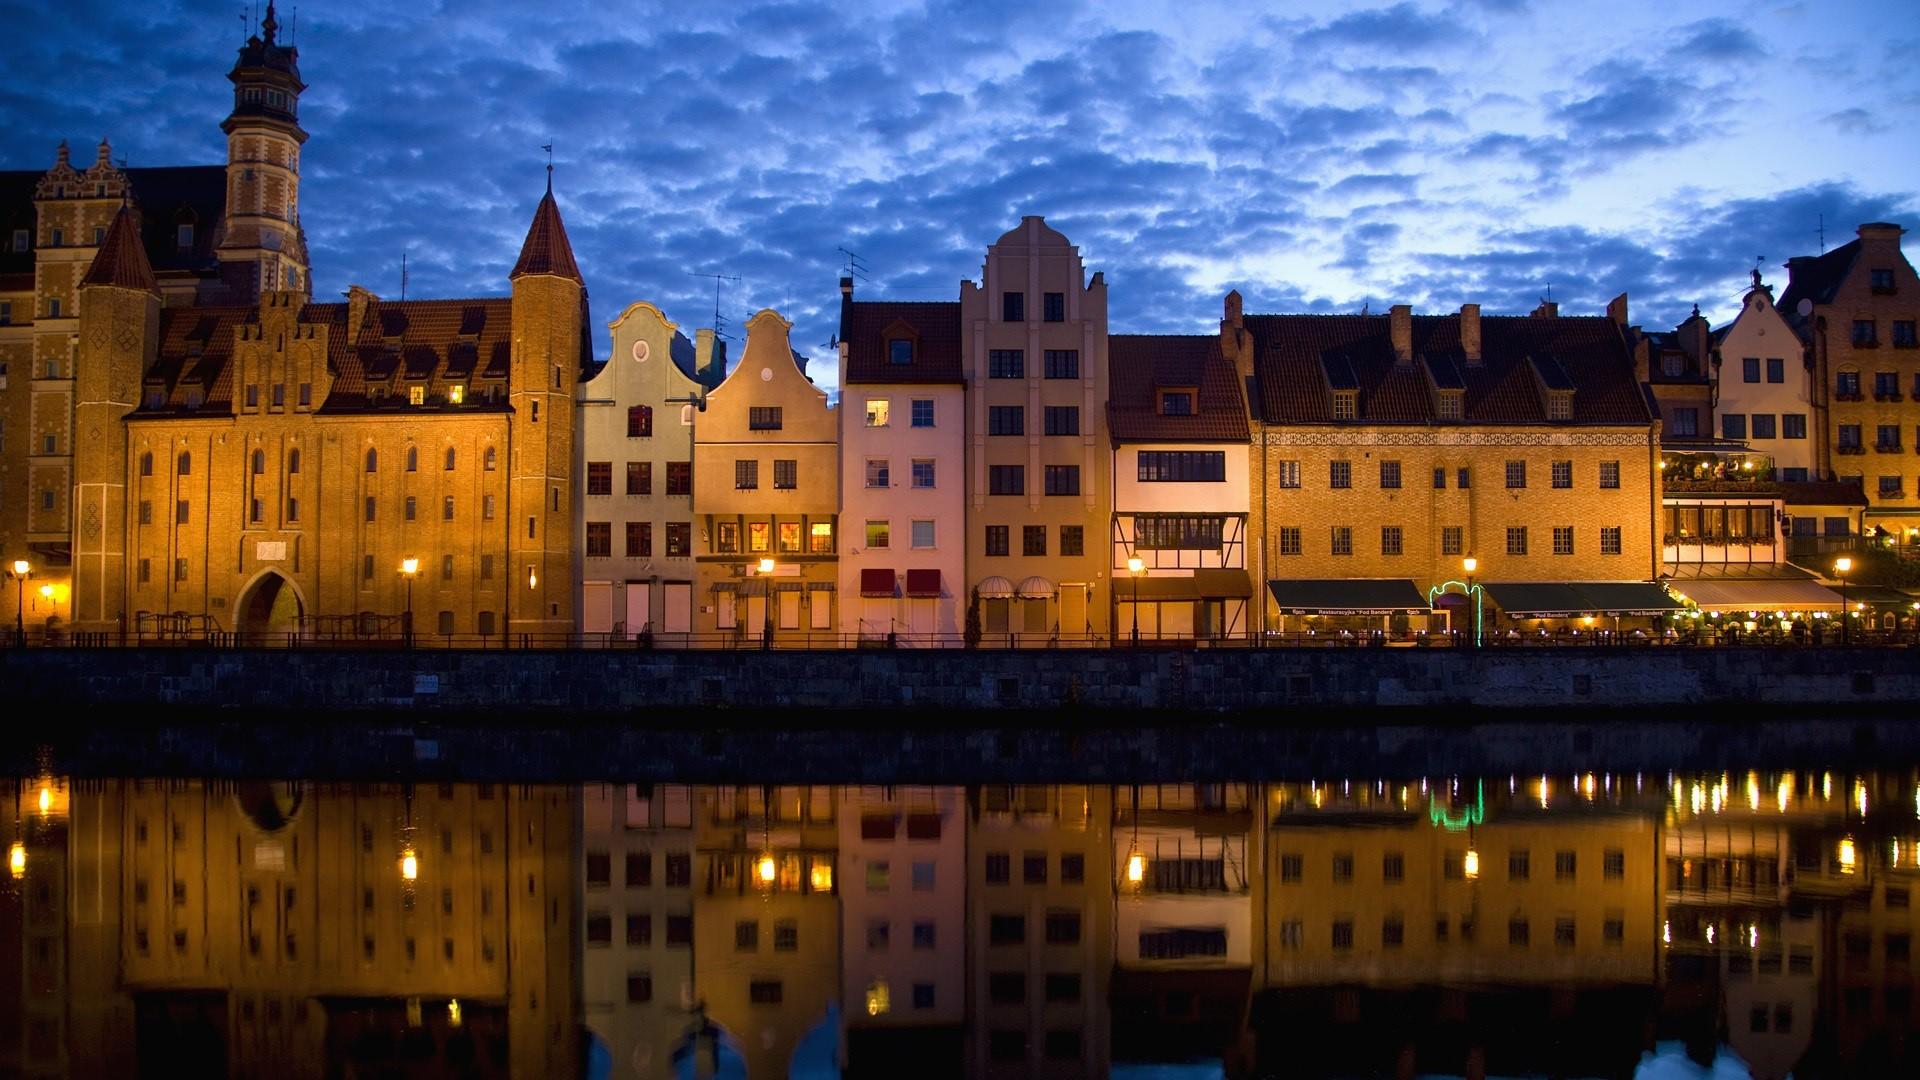 General 1920x1080 city building architecture reflection river water clouds night lights Gdańsk Poland symmetry Polish Motława River